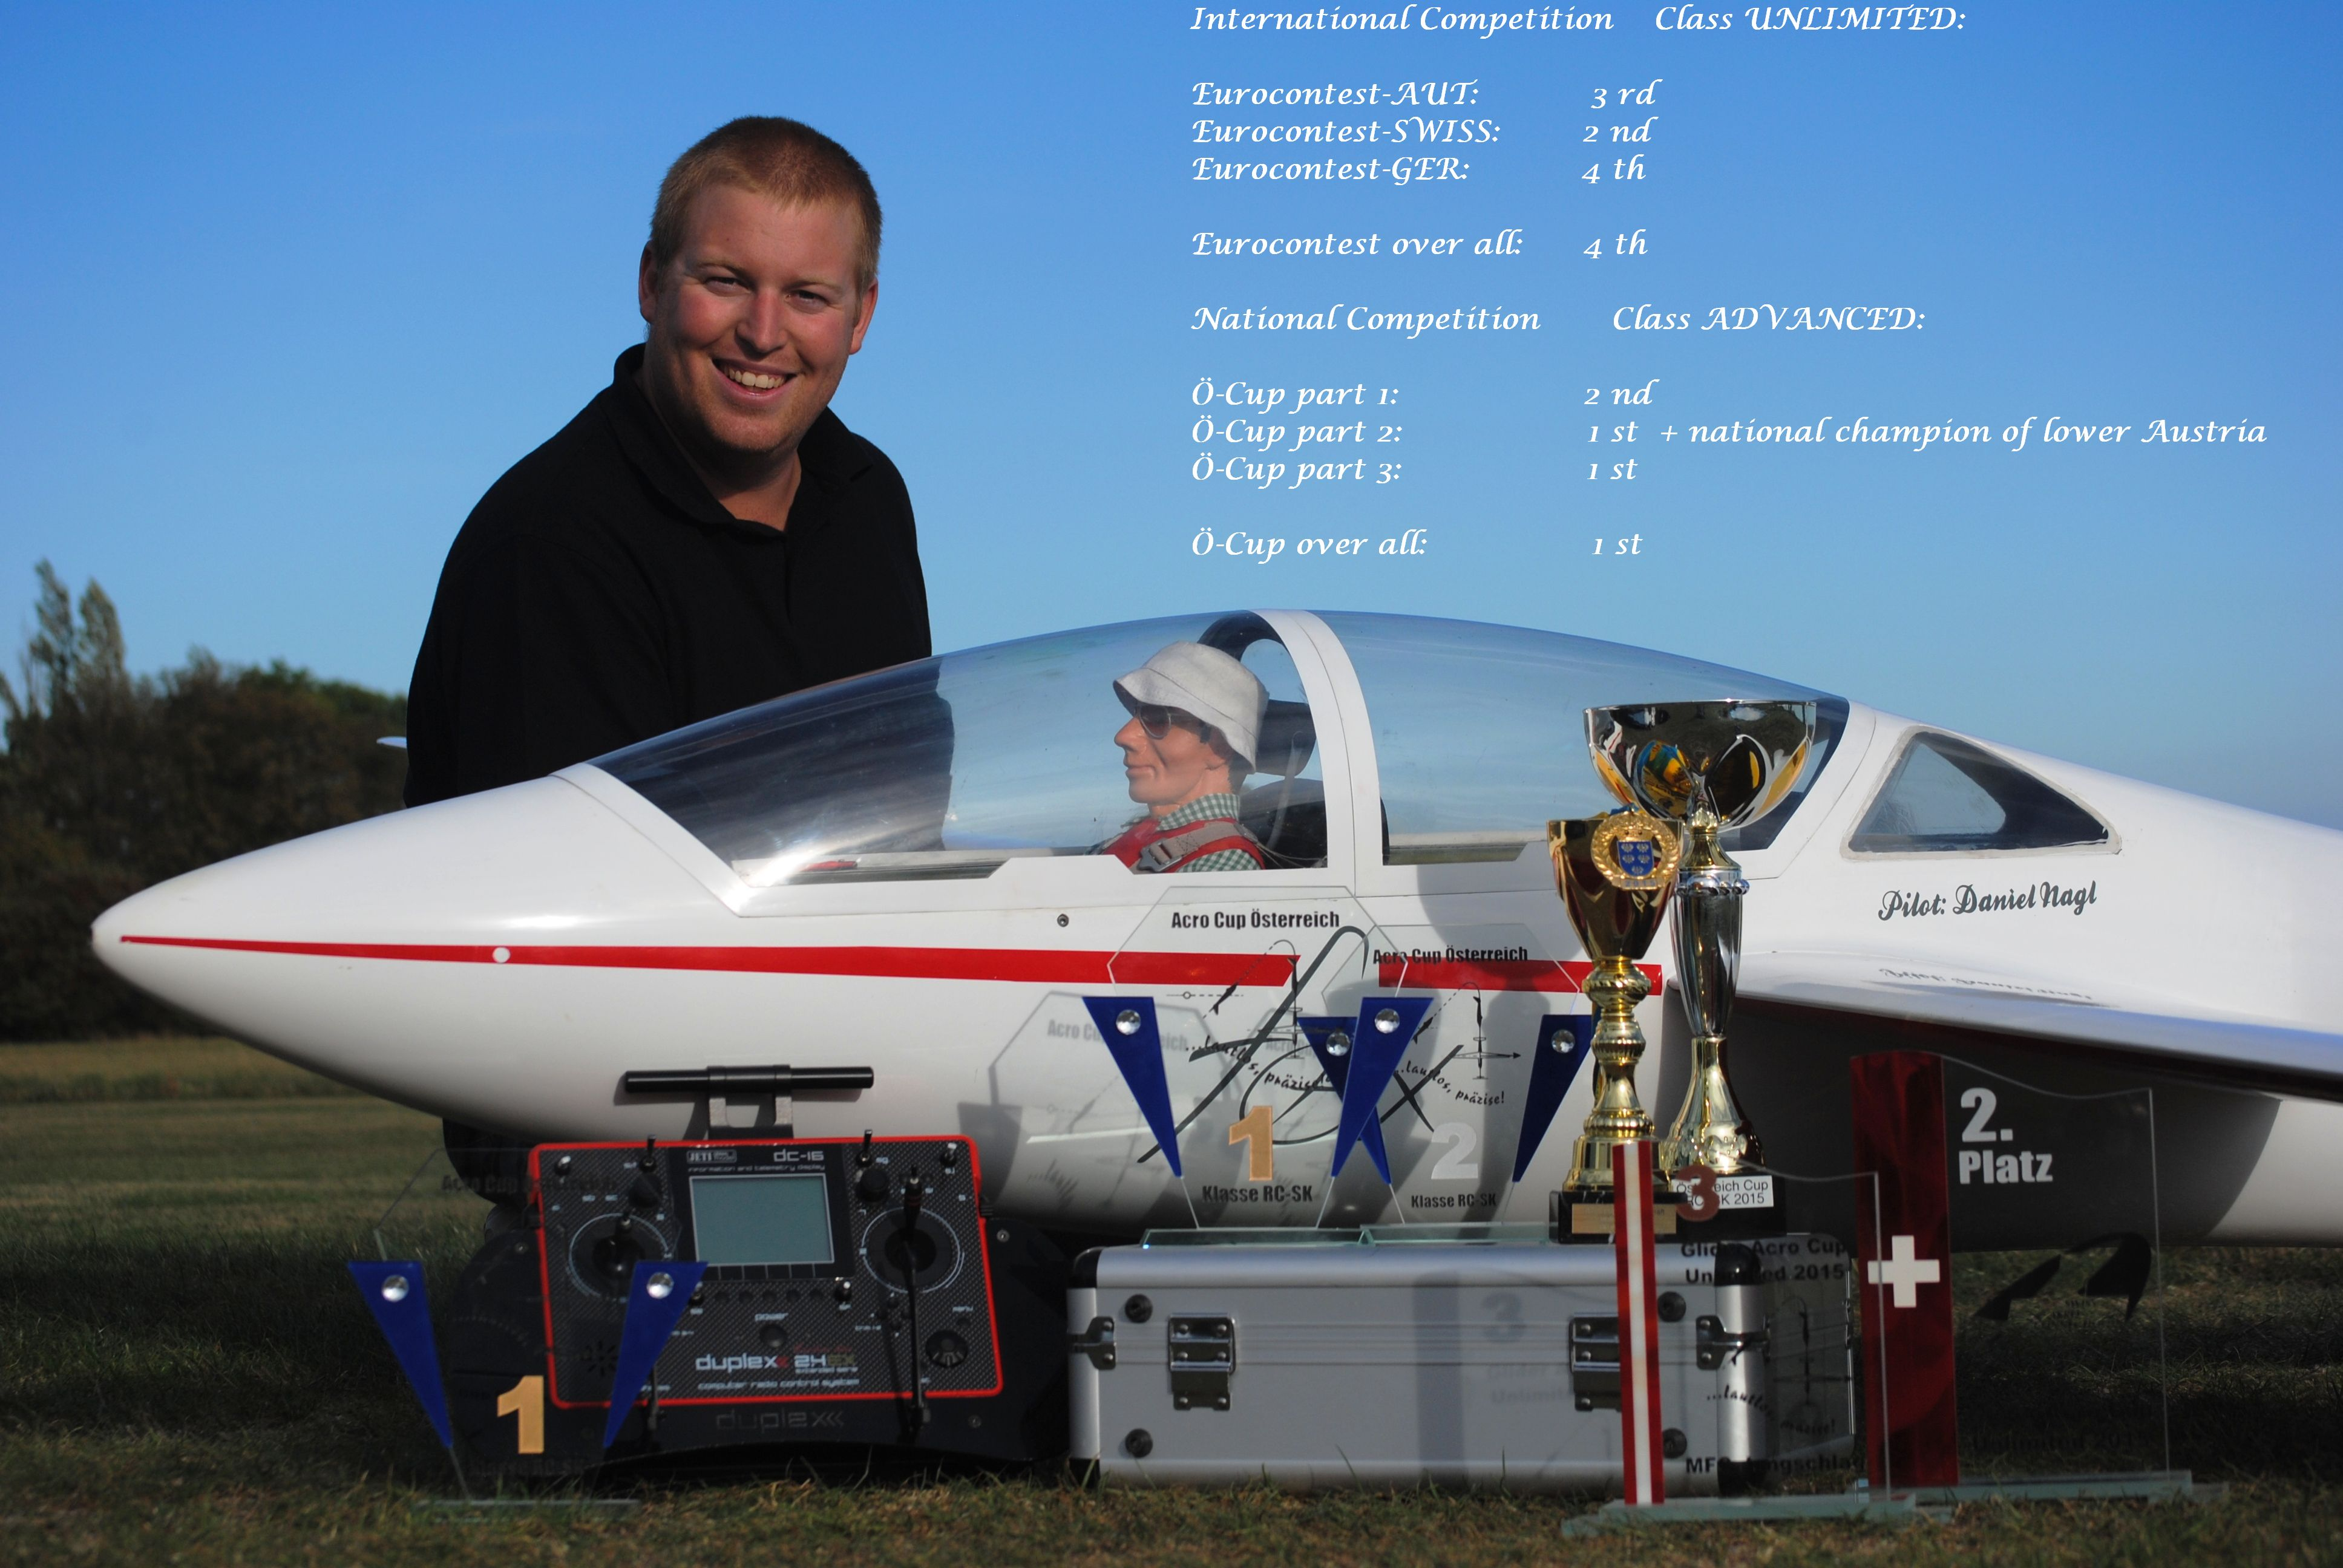 Daniel Nagl : Pilot